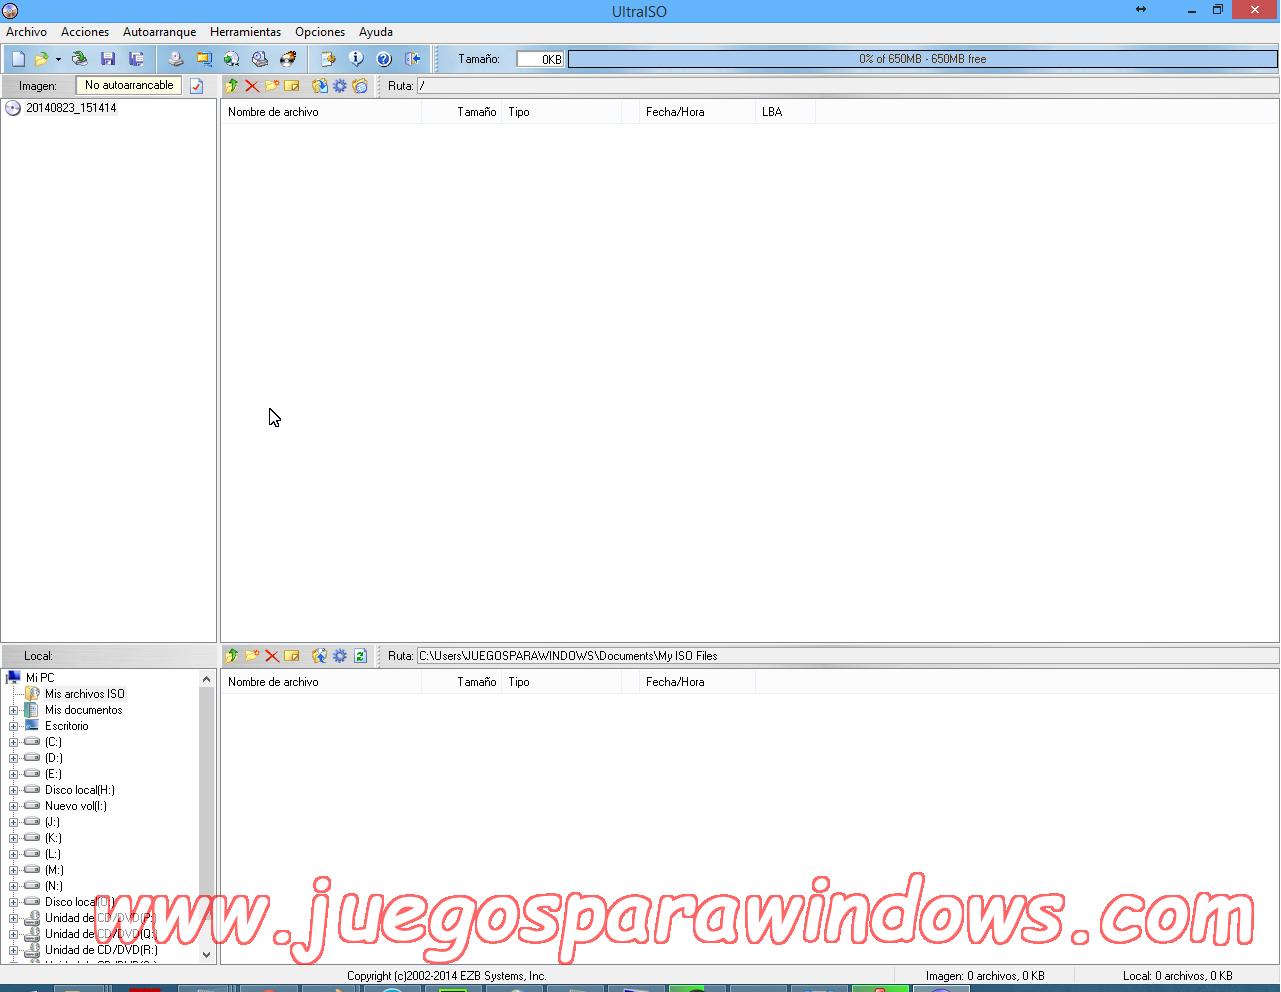 UltraISO Premium v9.6.2 Multilenguaje ESPAÑOL Editor De Archivos De Imagen CD/DVD 5